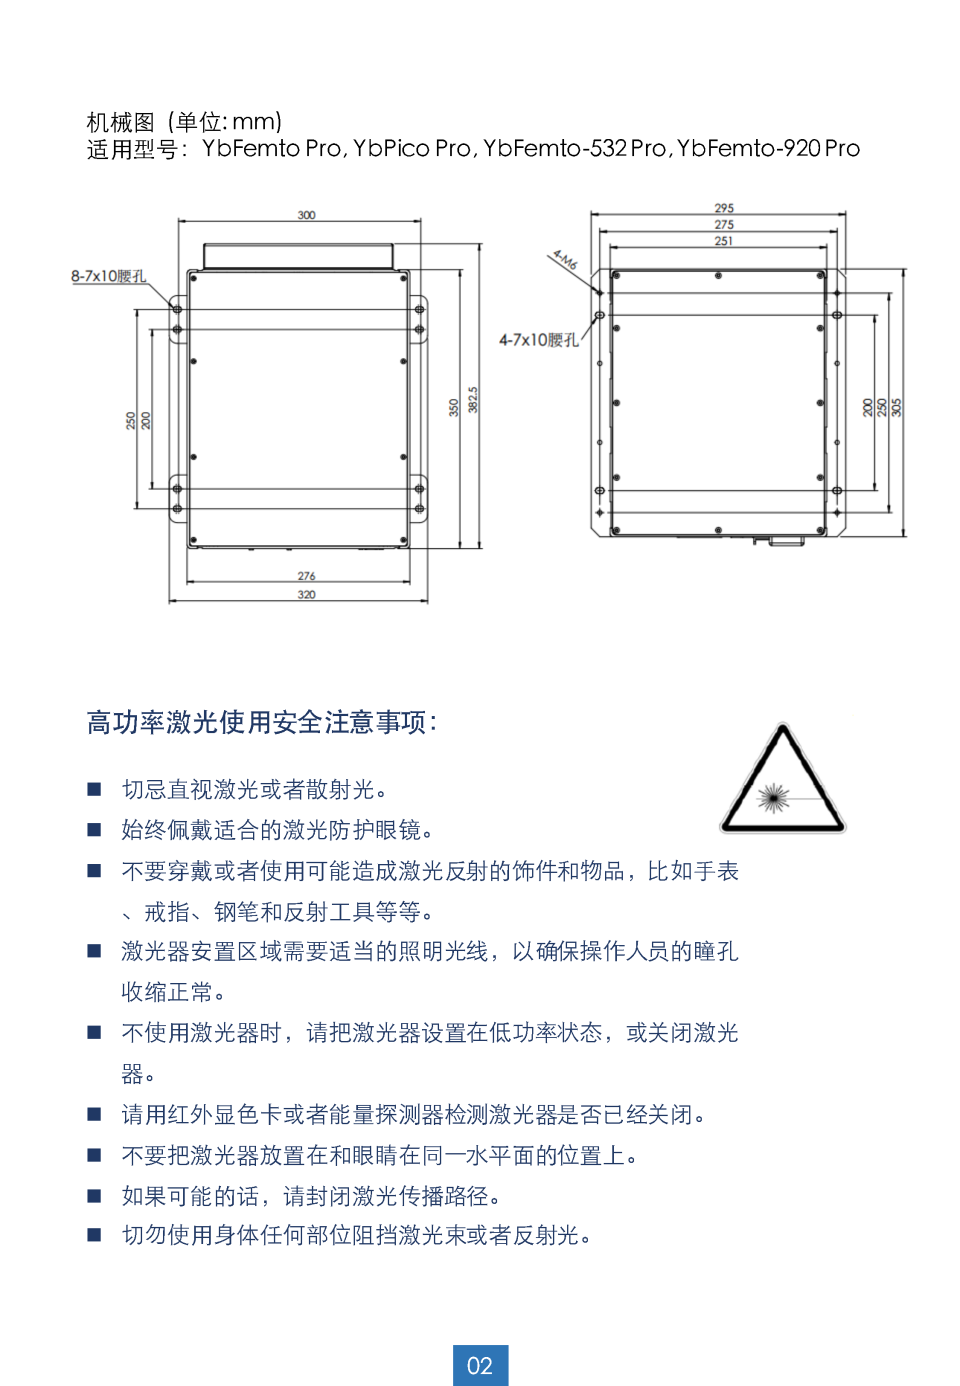 XFiber Pro 系列 - YbFiber Pro 系列_页面_2.png